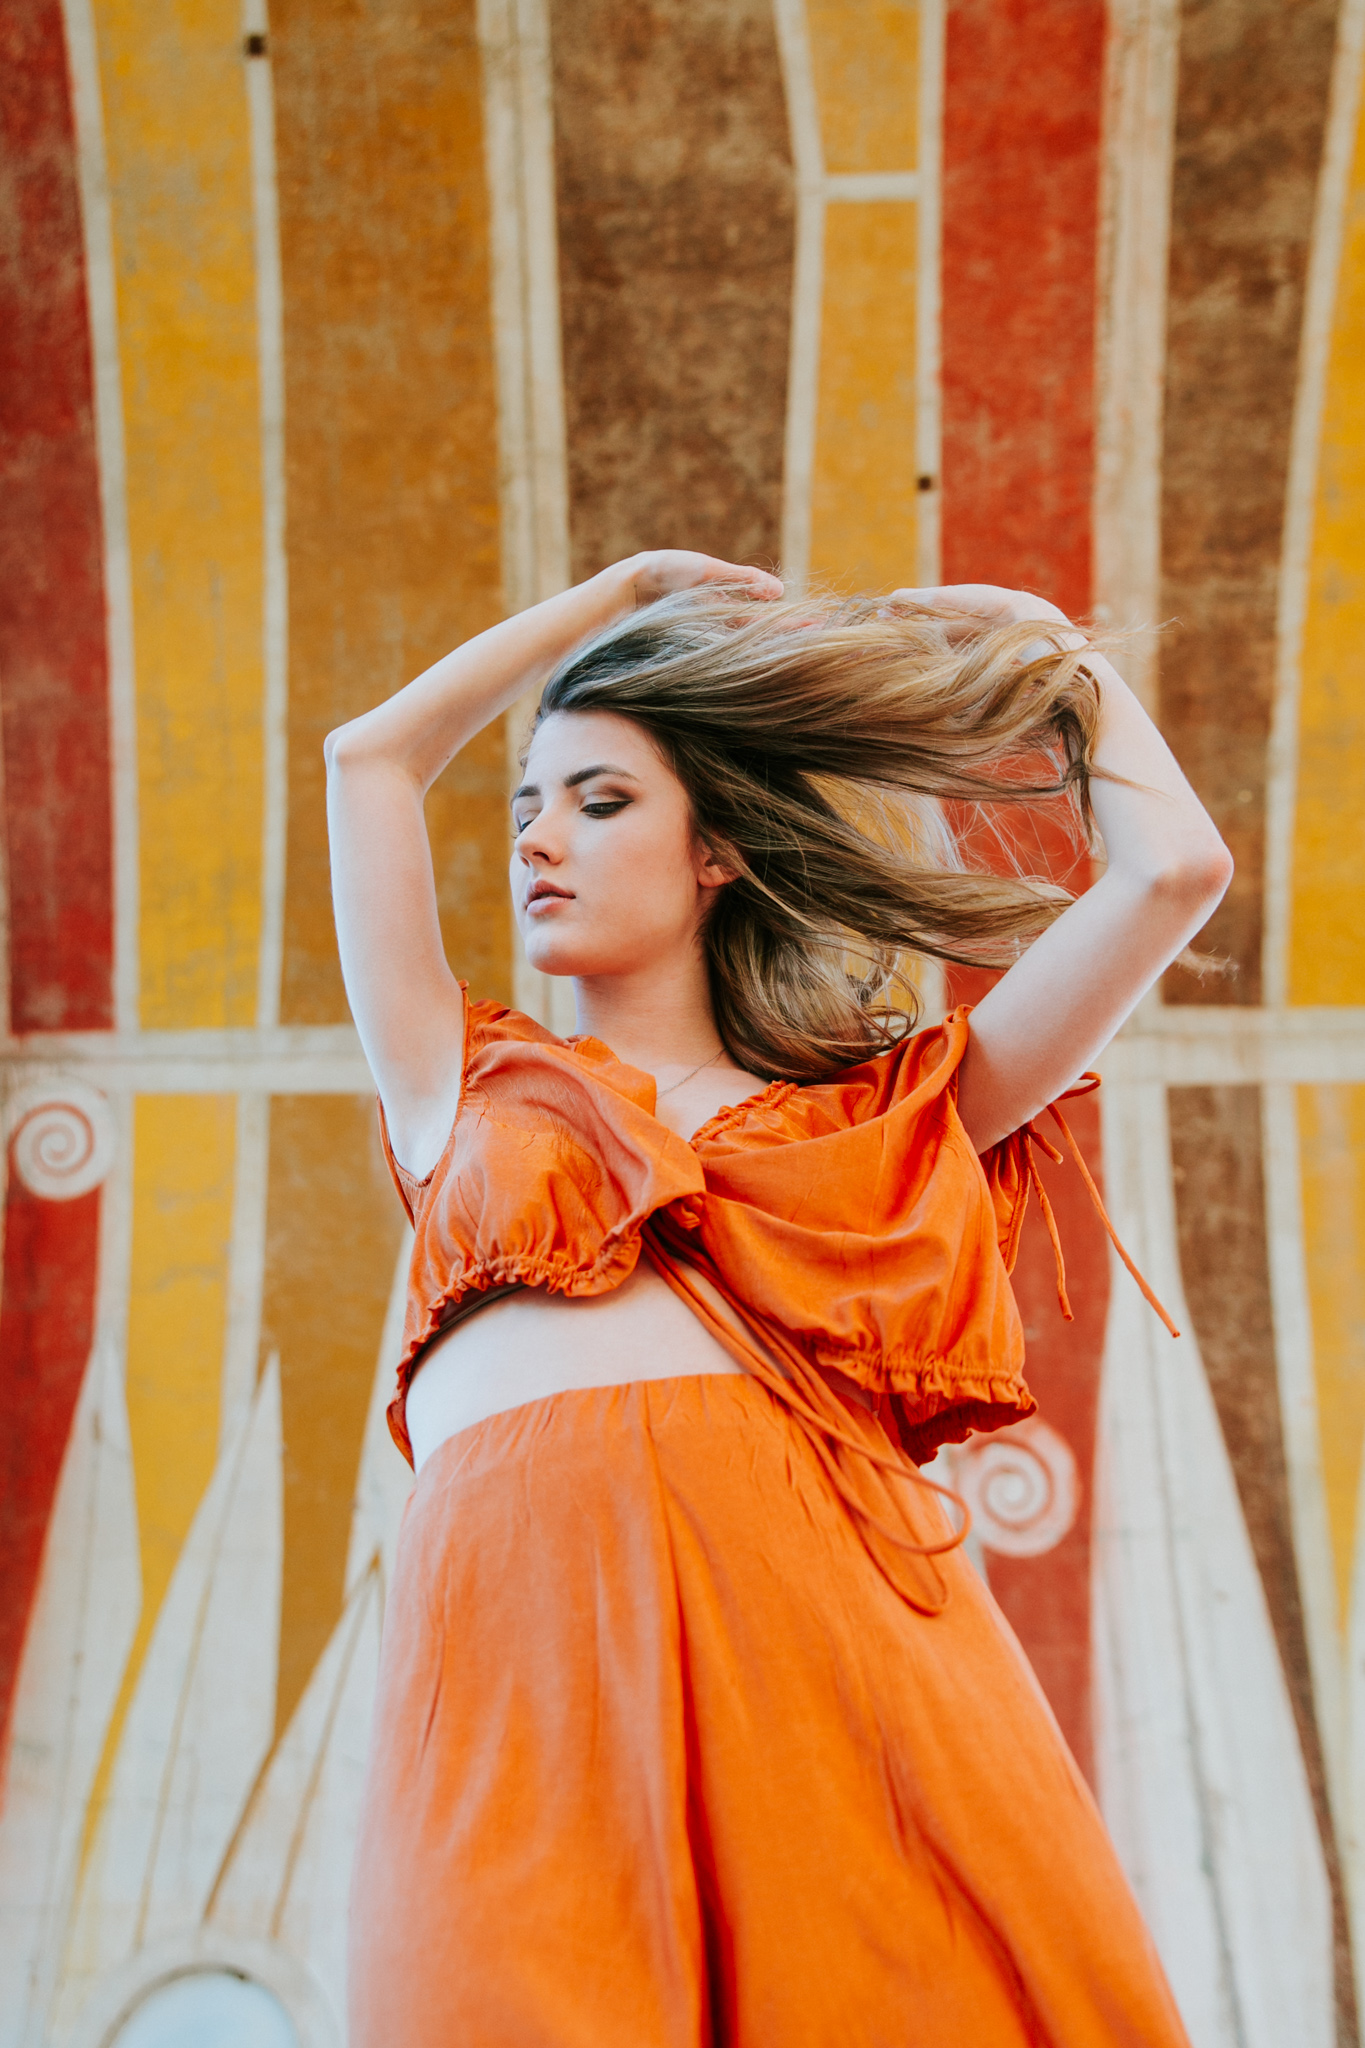 ChelseaScottEvans-Arcosanti-028.jpg